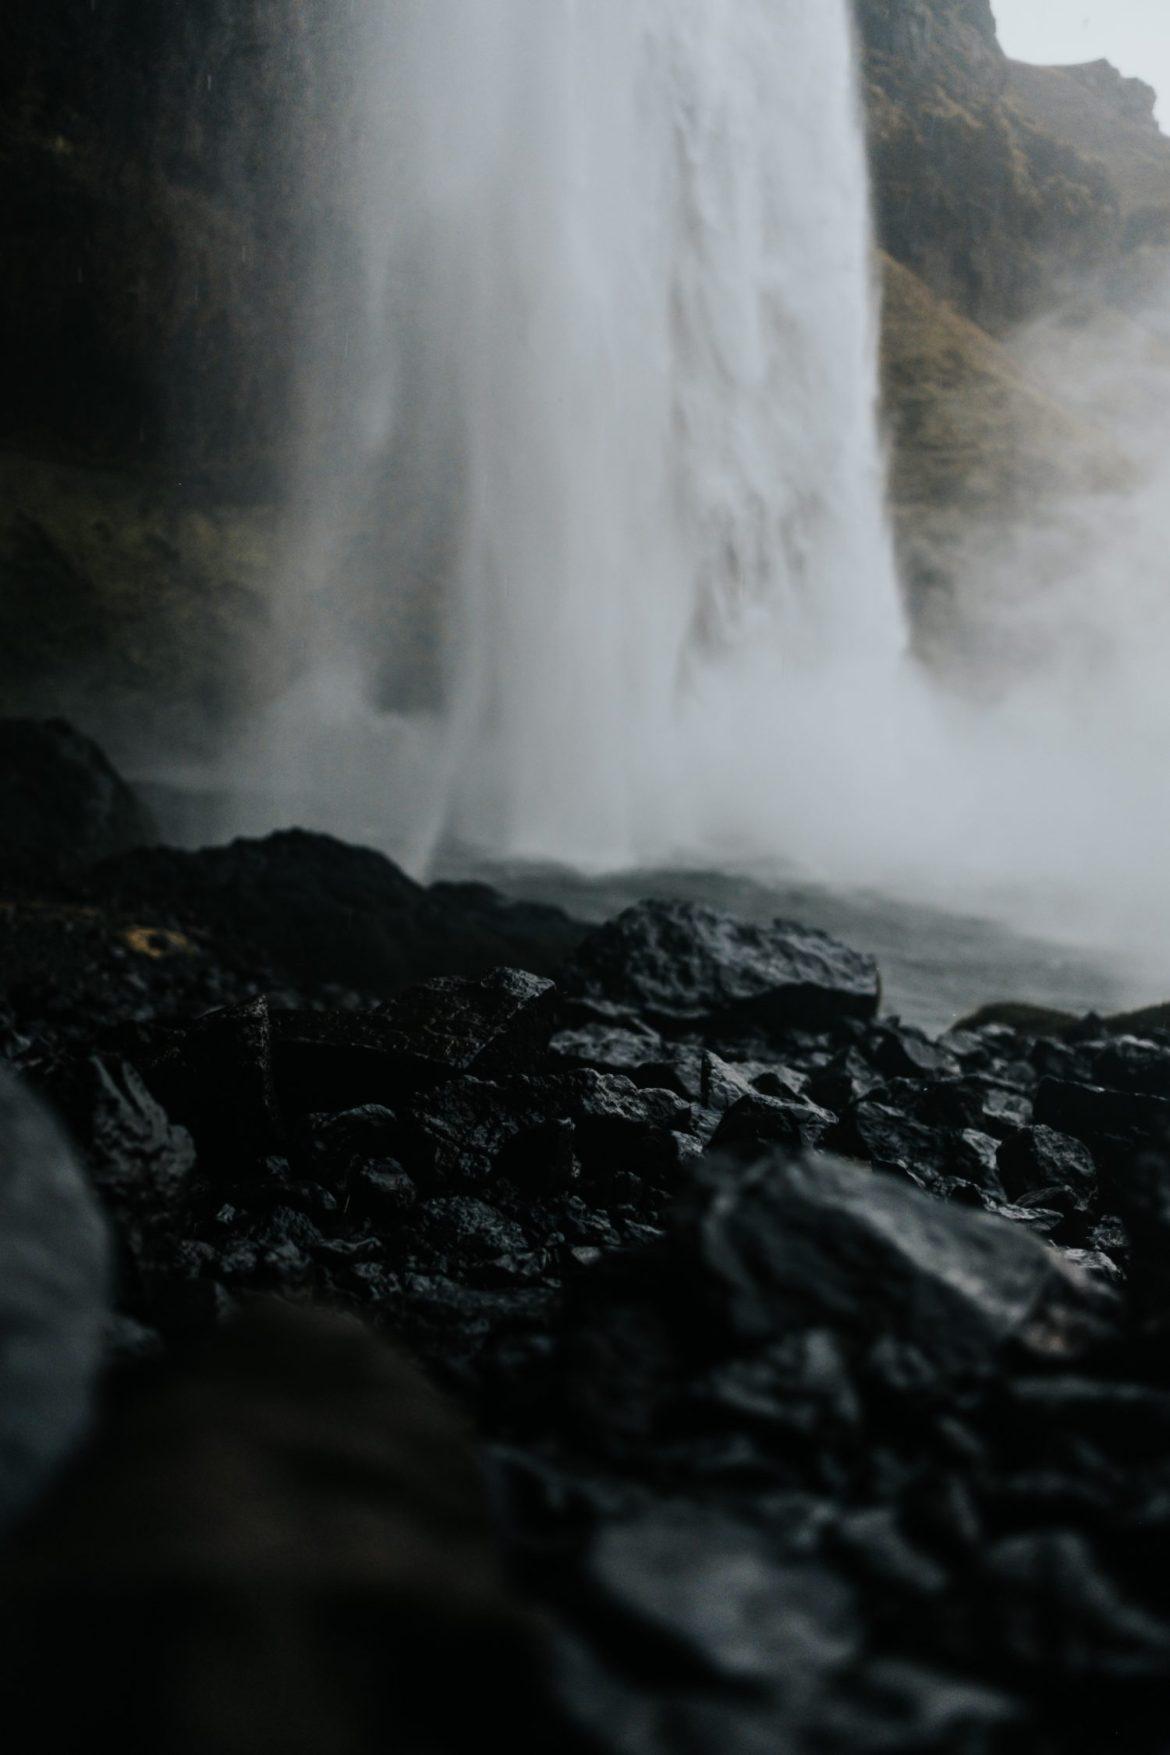 Waterfall on rocks